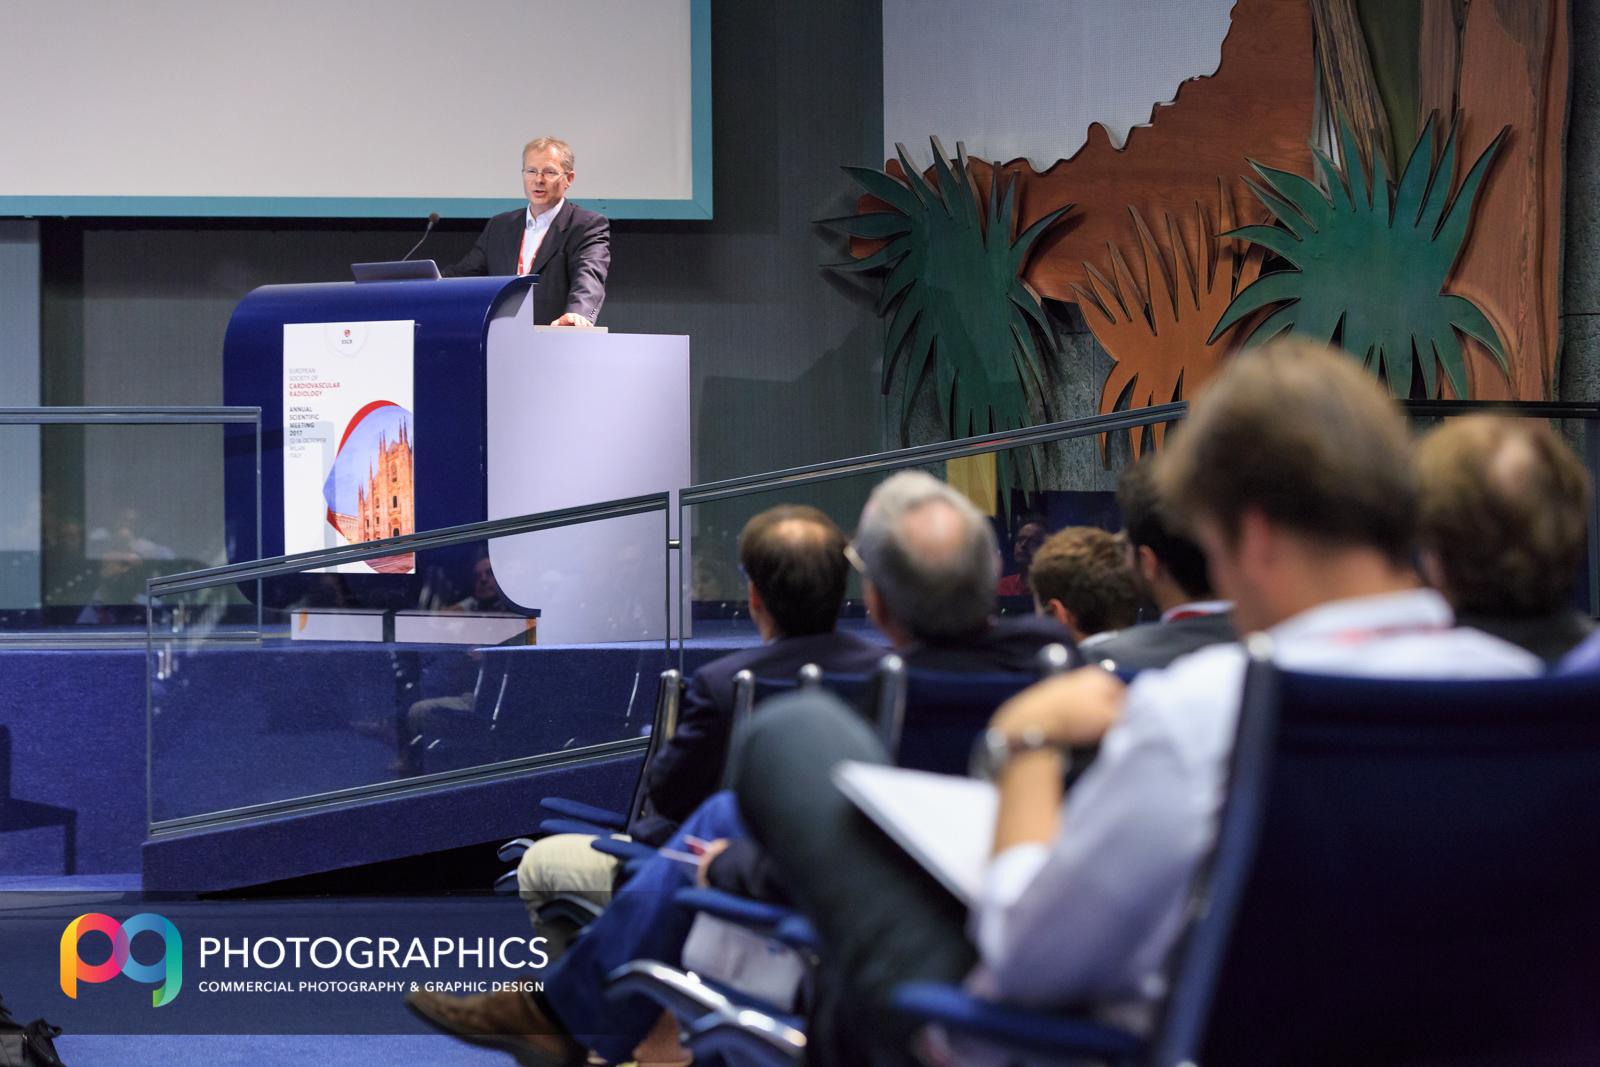 ESCR-2018-conference-event-photography-UK-glasgow-edinburgh-31.jpg